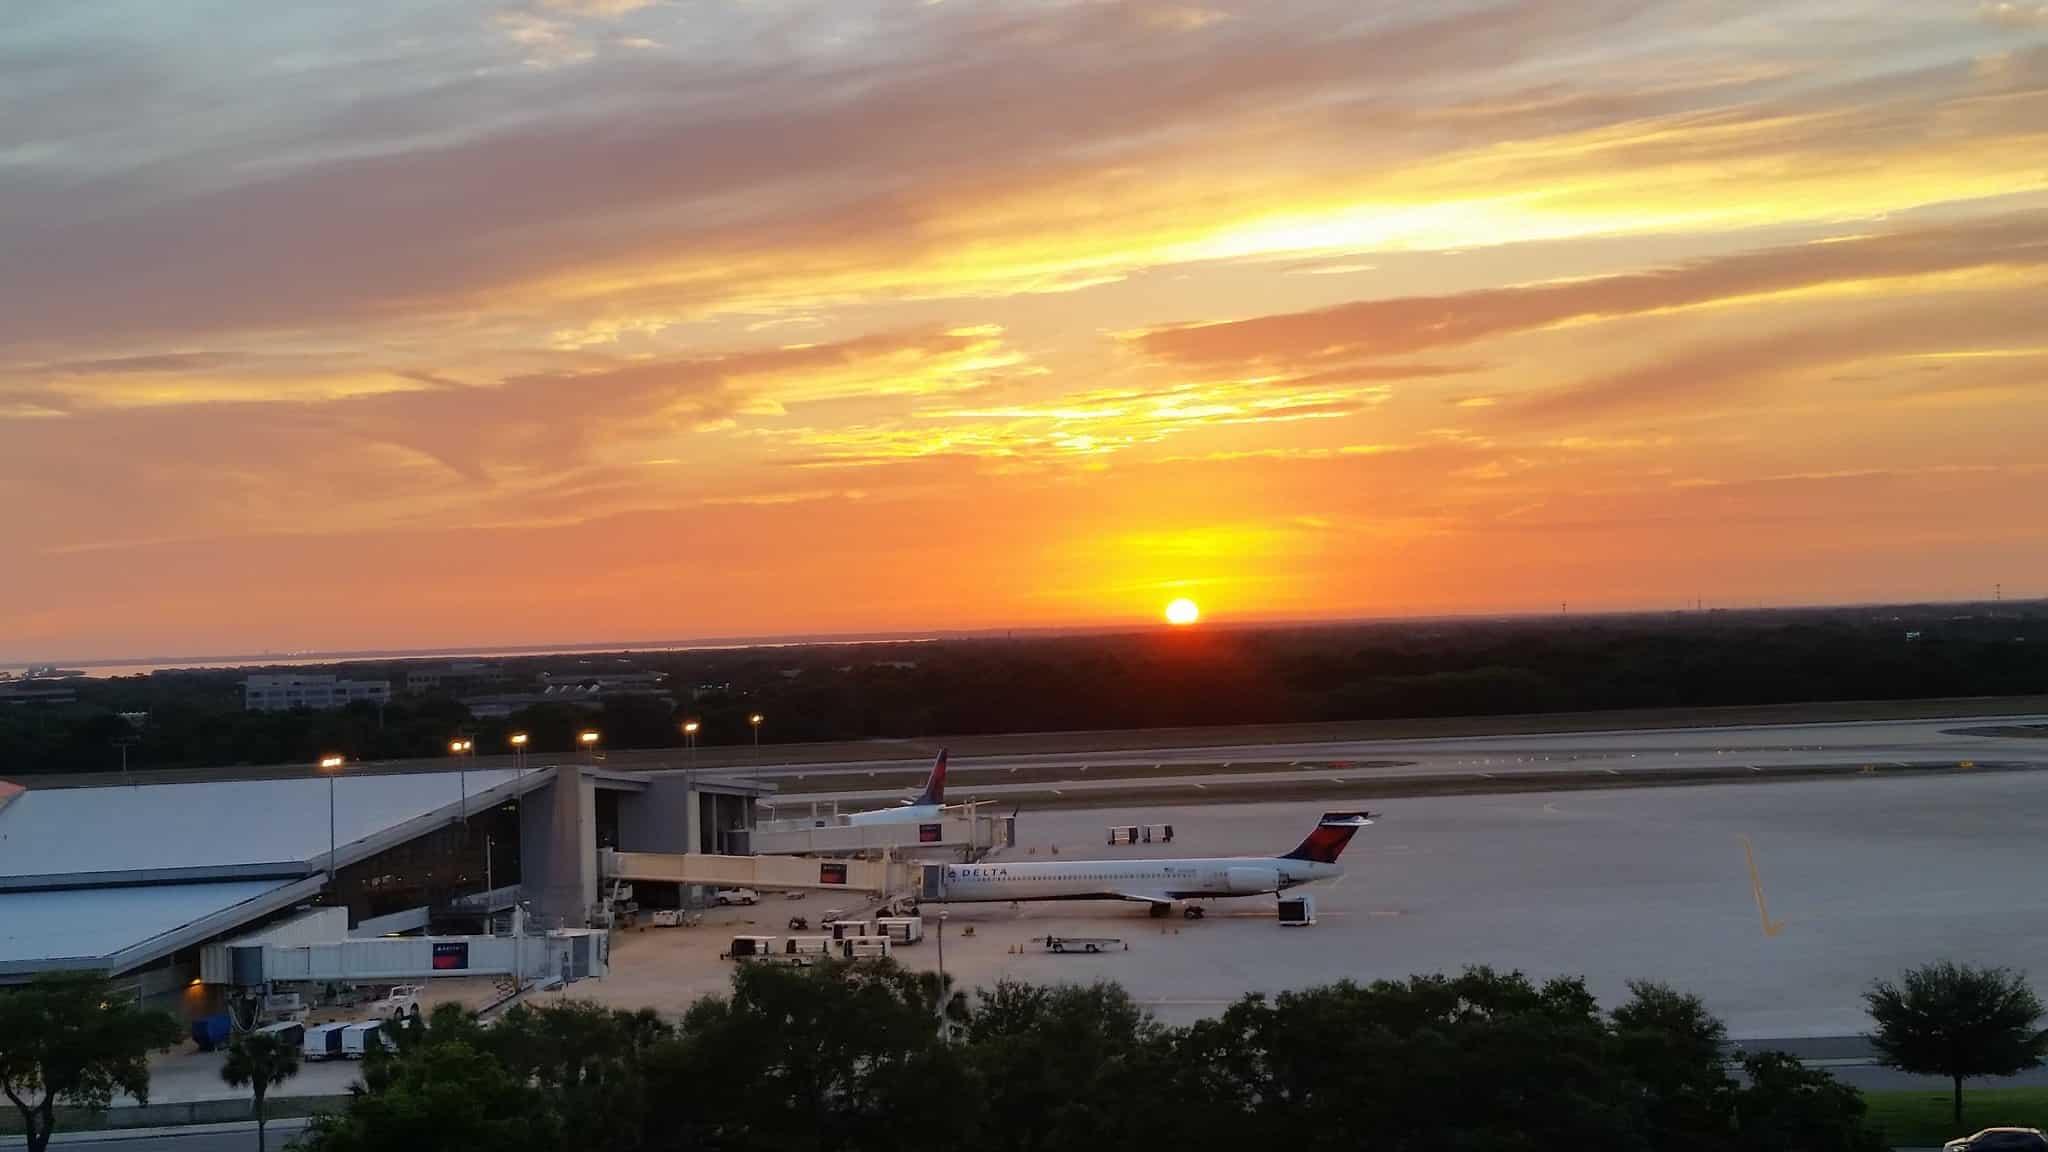 tampa international airport sunset